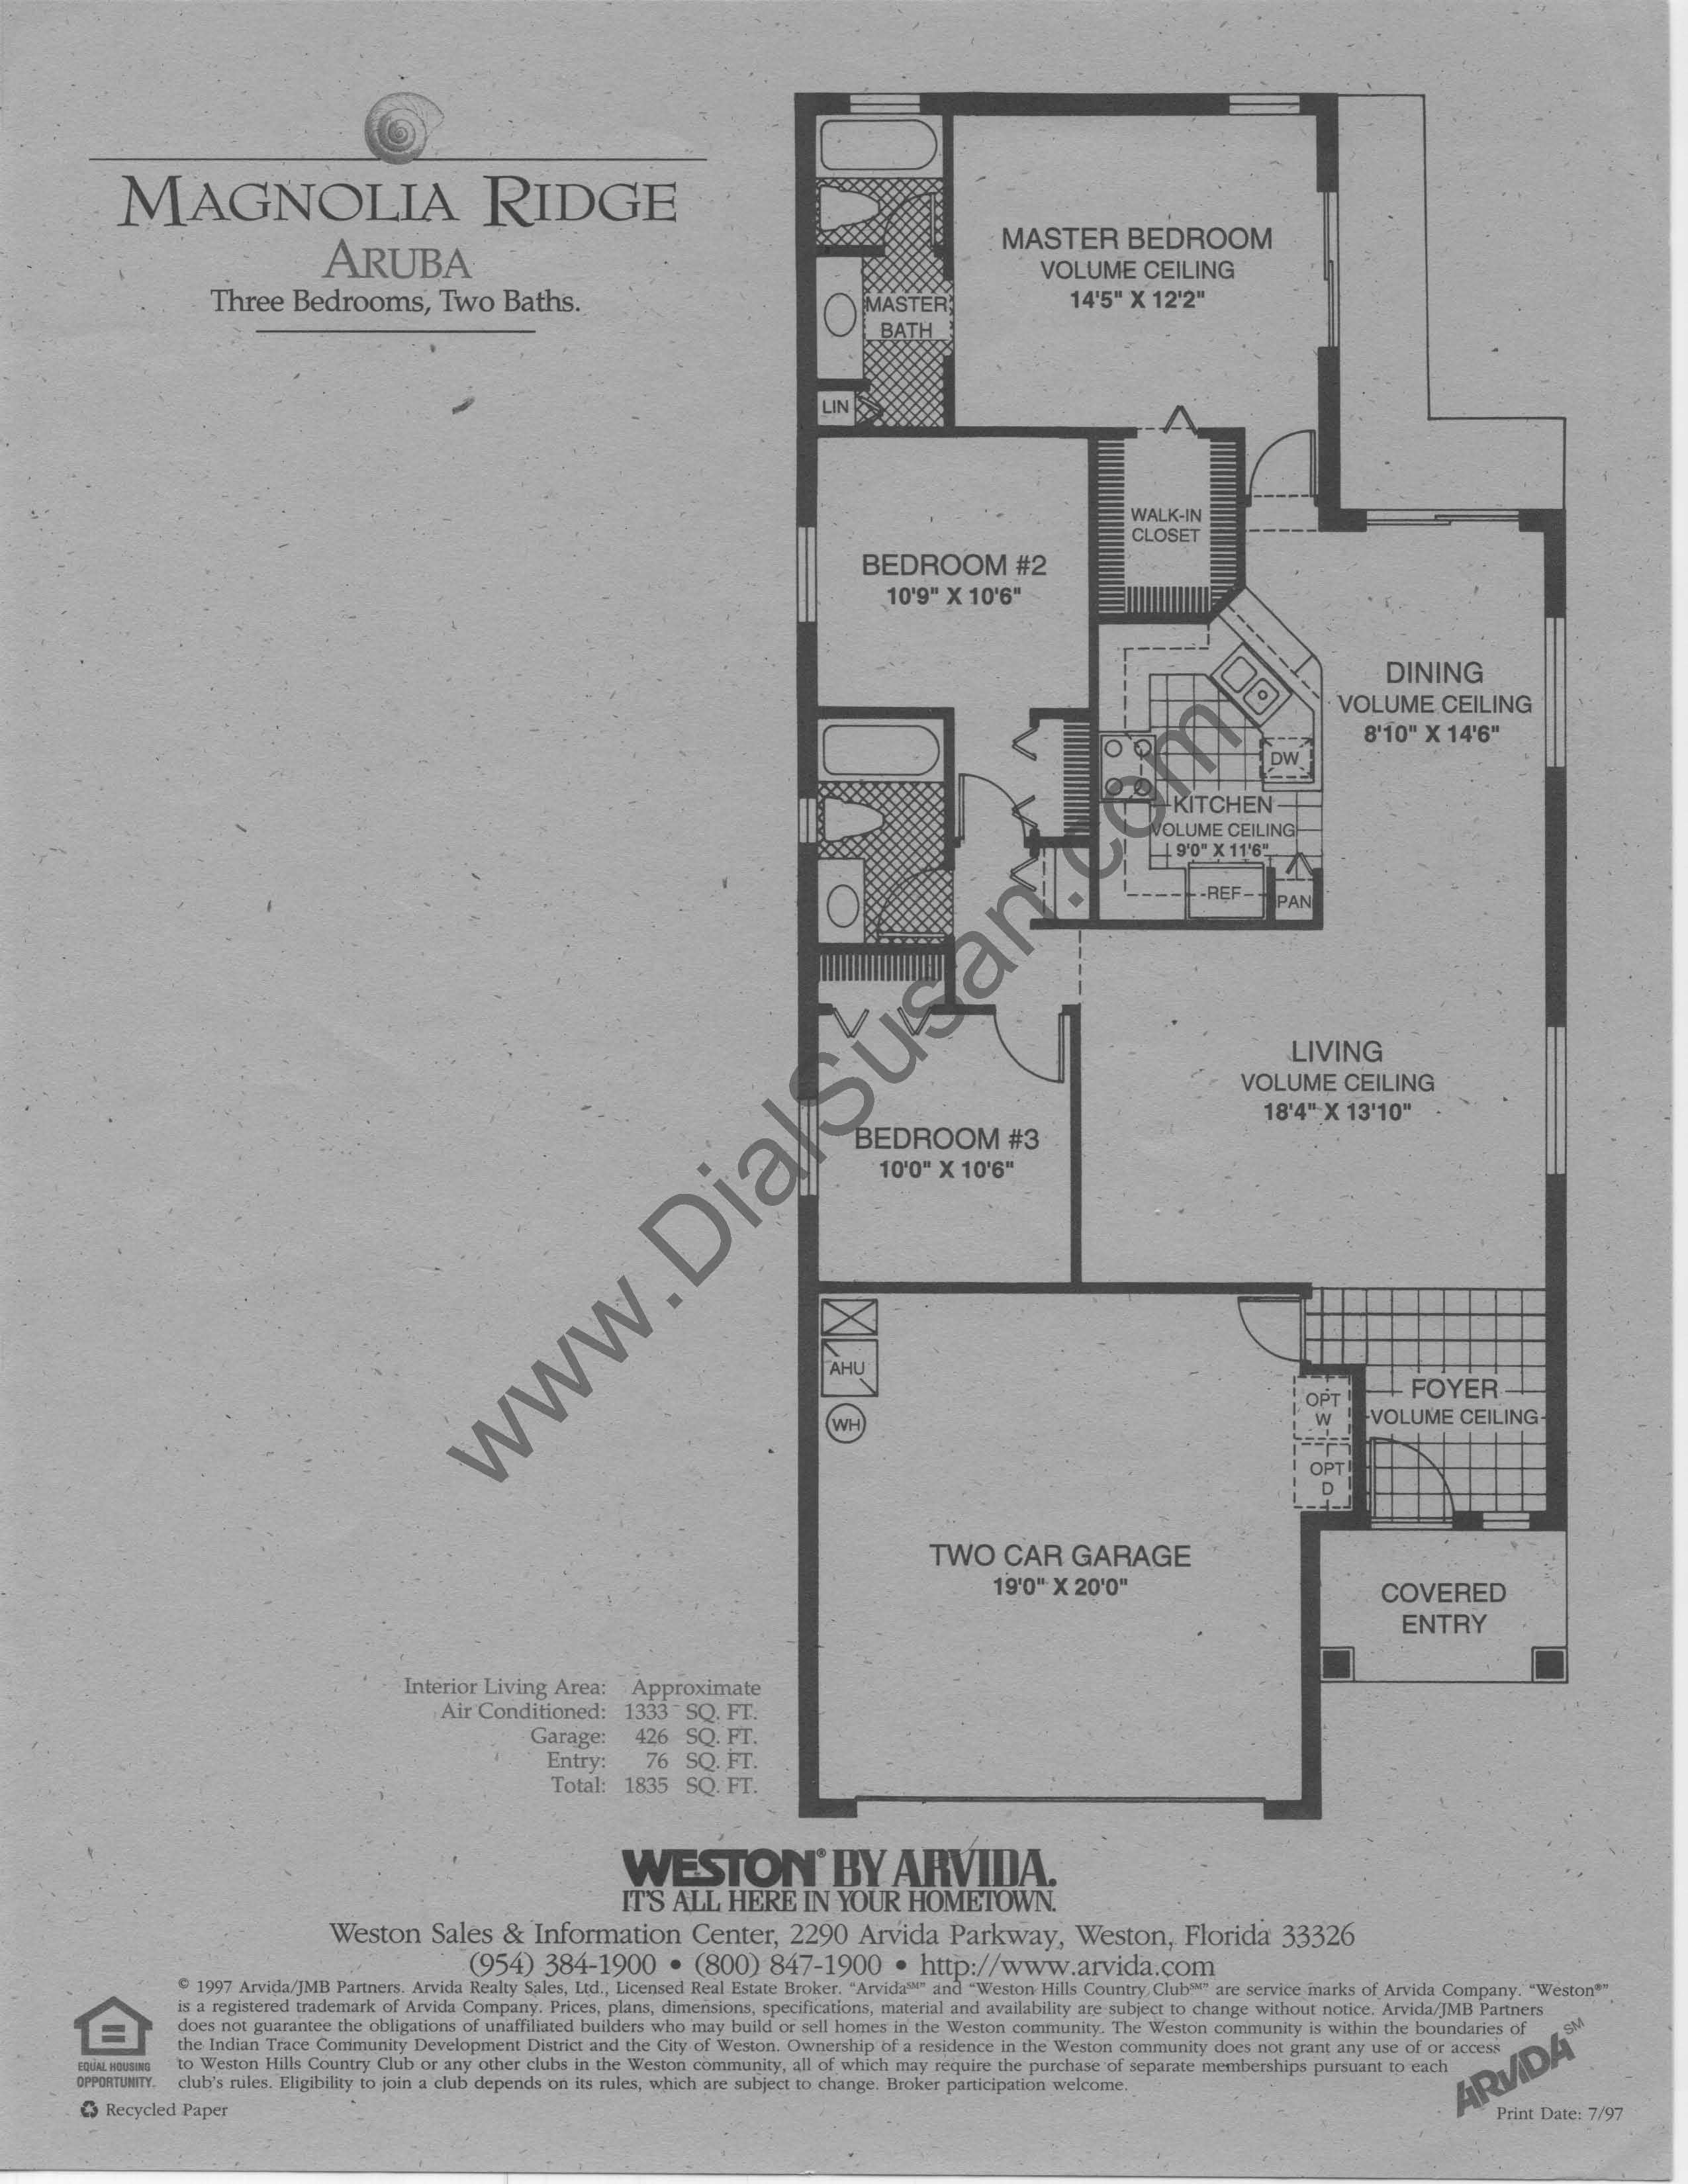 Magnolia Ridge 01 Aruba susan hesselman realtor in the ridges,Arvida Homes Floor Plans